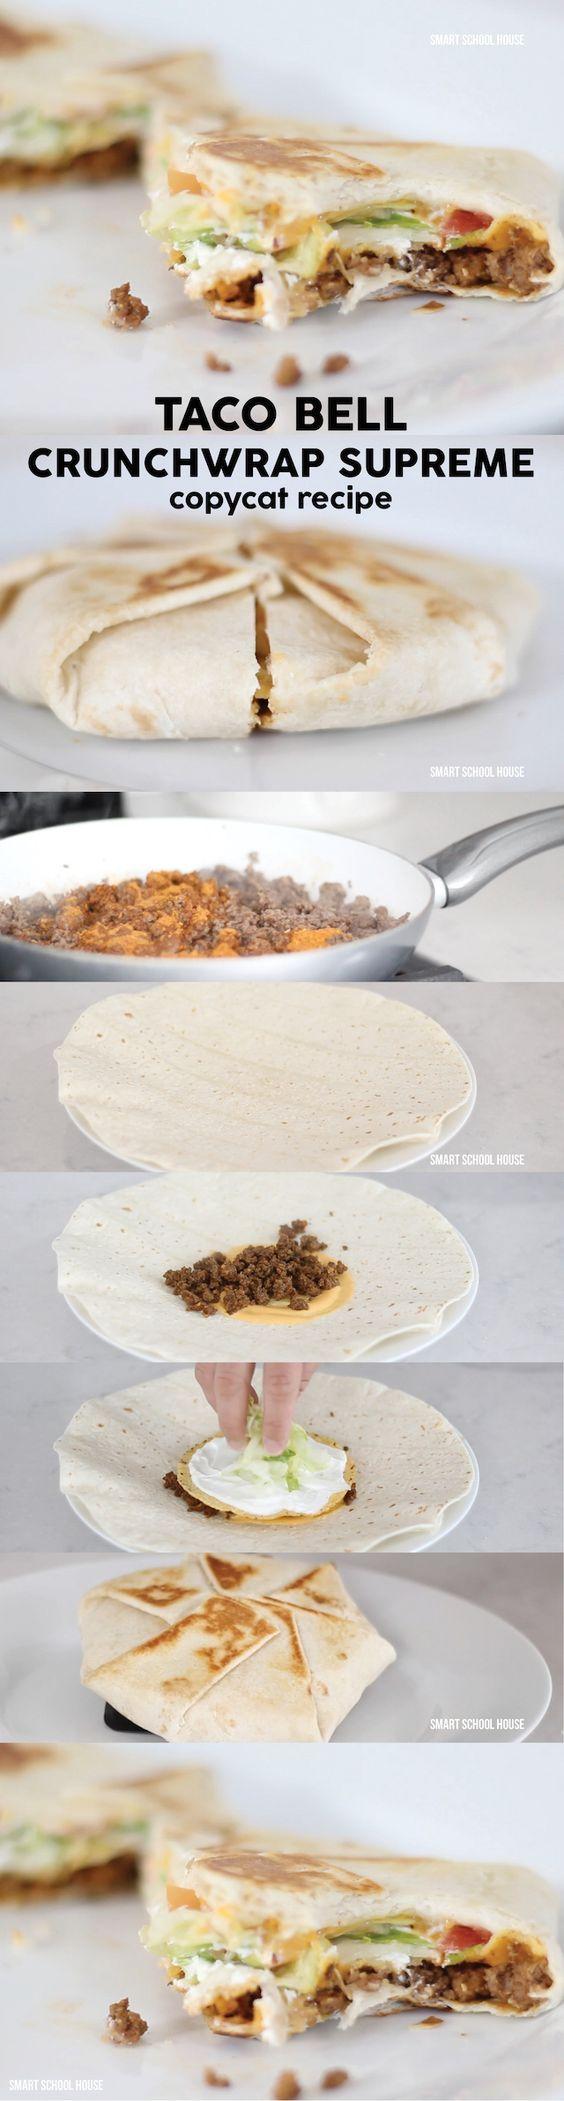 DIY Taco Bell Crunchwrap Recipe - Smart School House DIY Taco Bell Crunchwrap Supreme copycat recipe to make a home. Saving this!